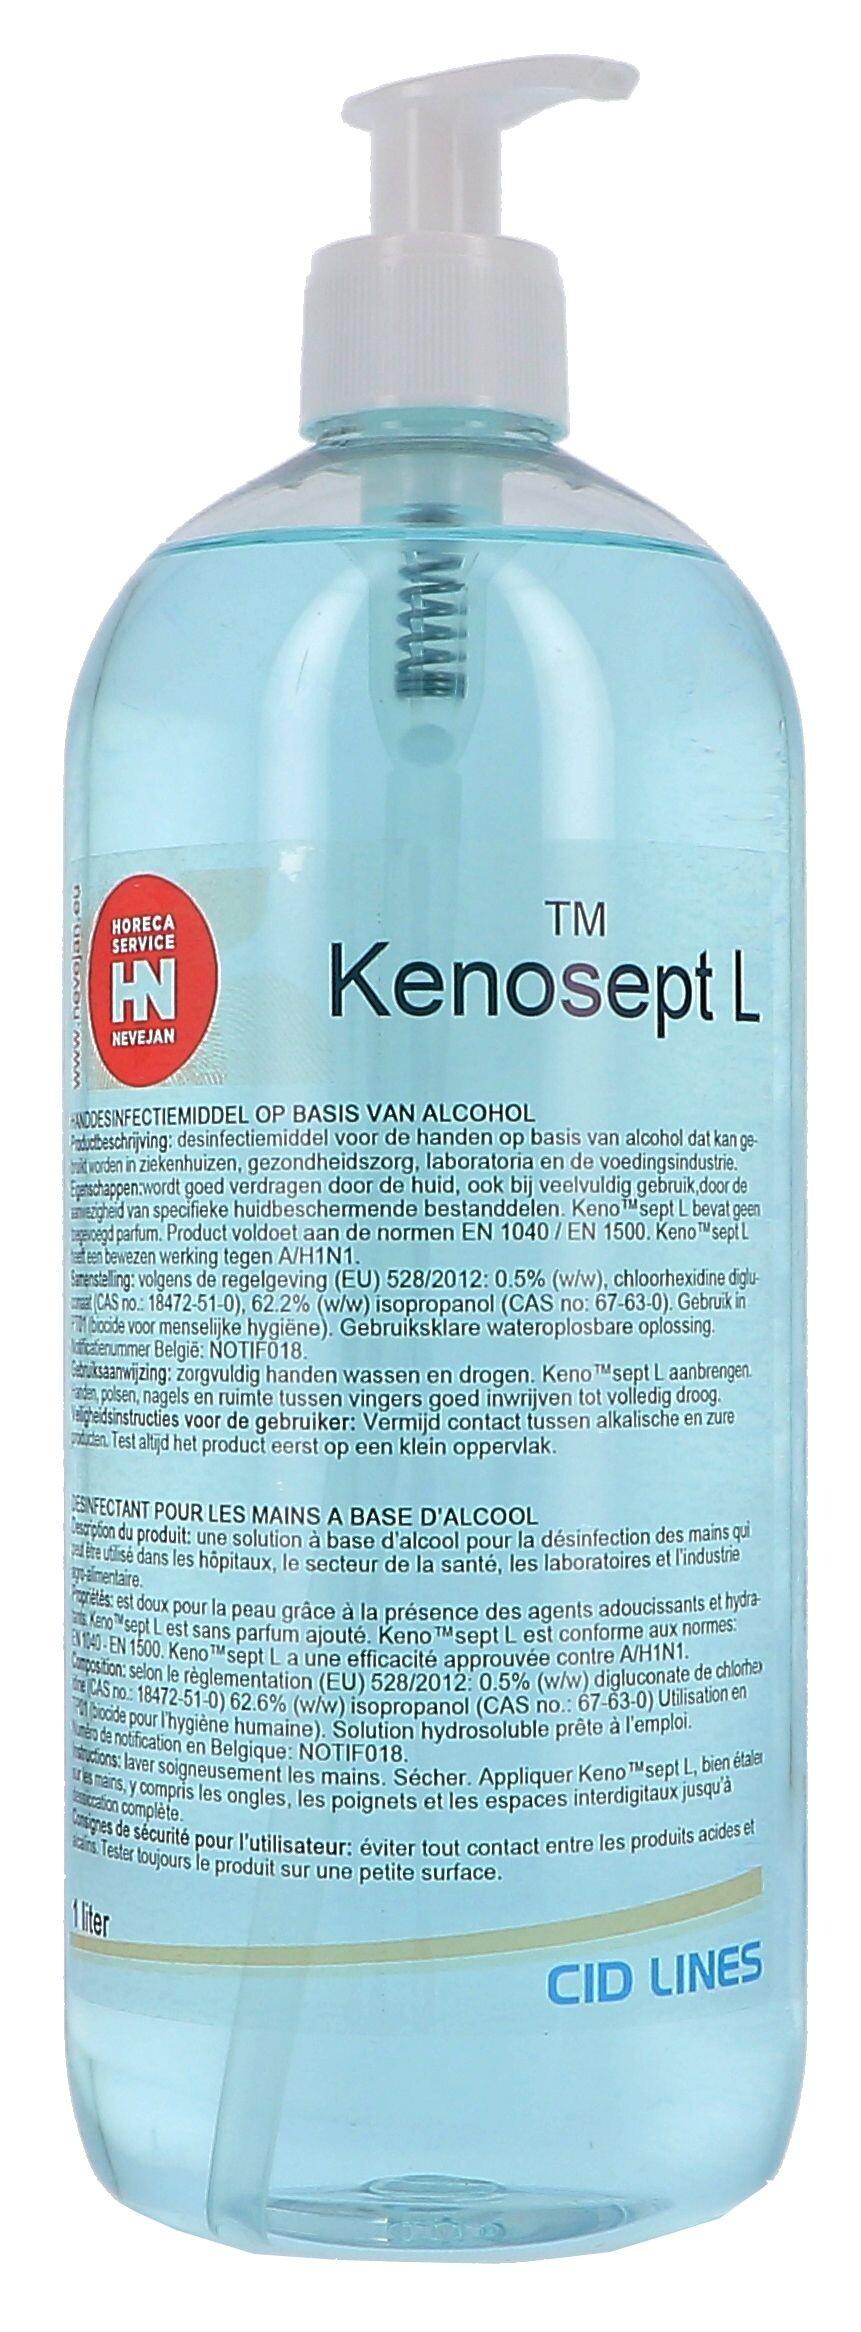 Kenosept-L Disinfection for hands 1000ml Cid Lines (Hygiëneproducten)